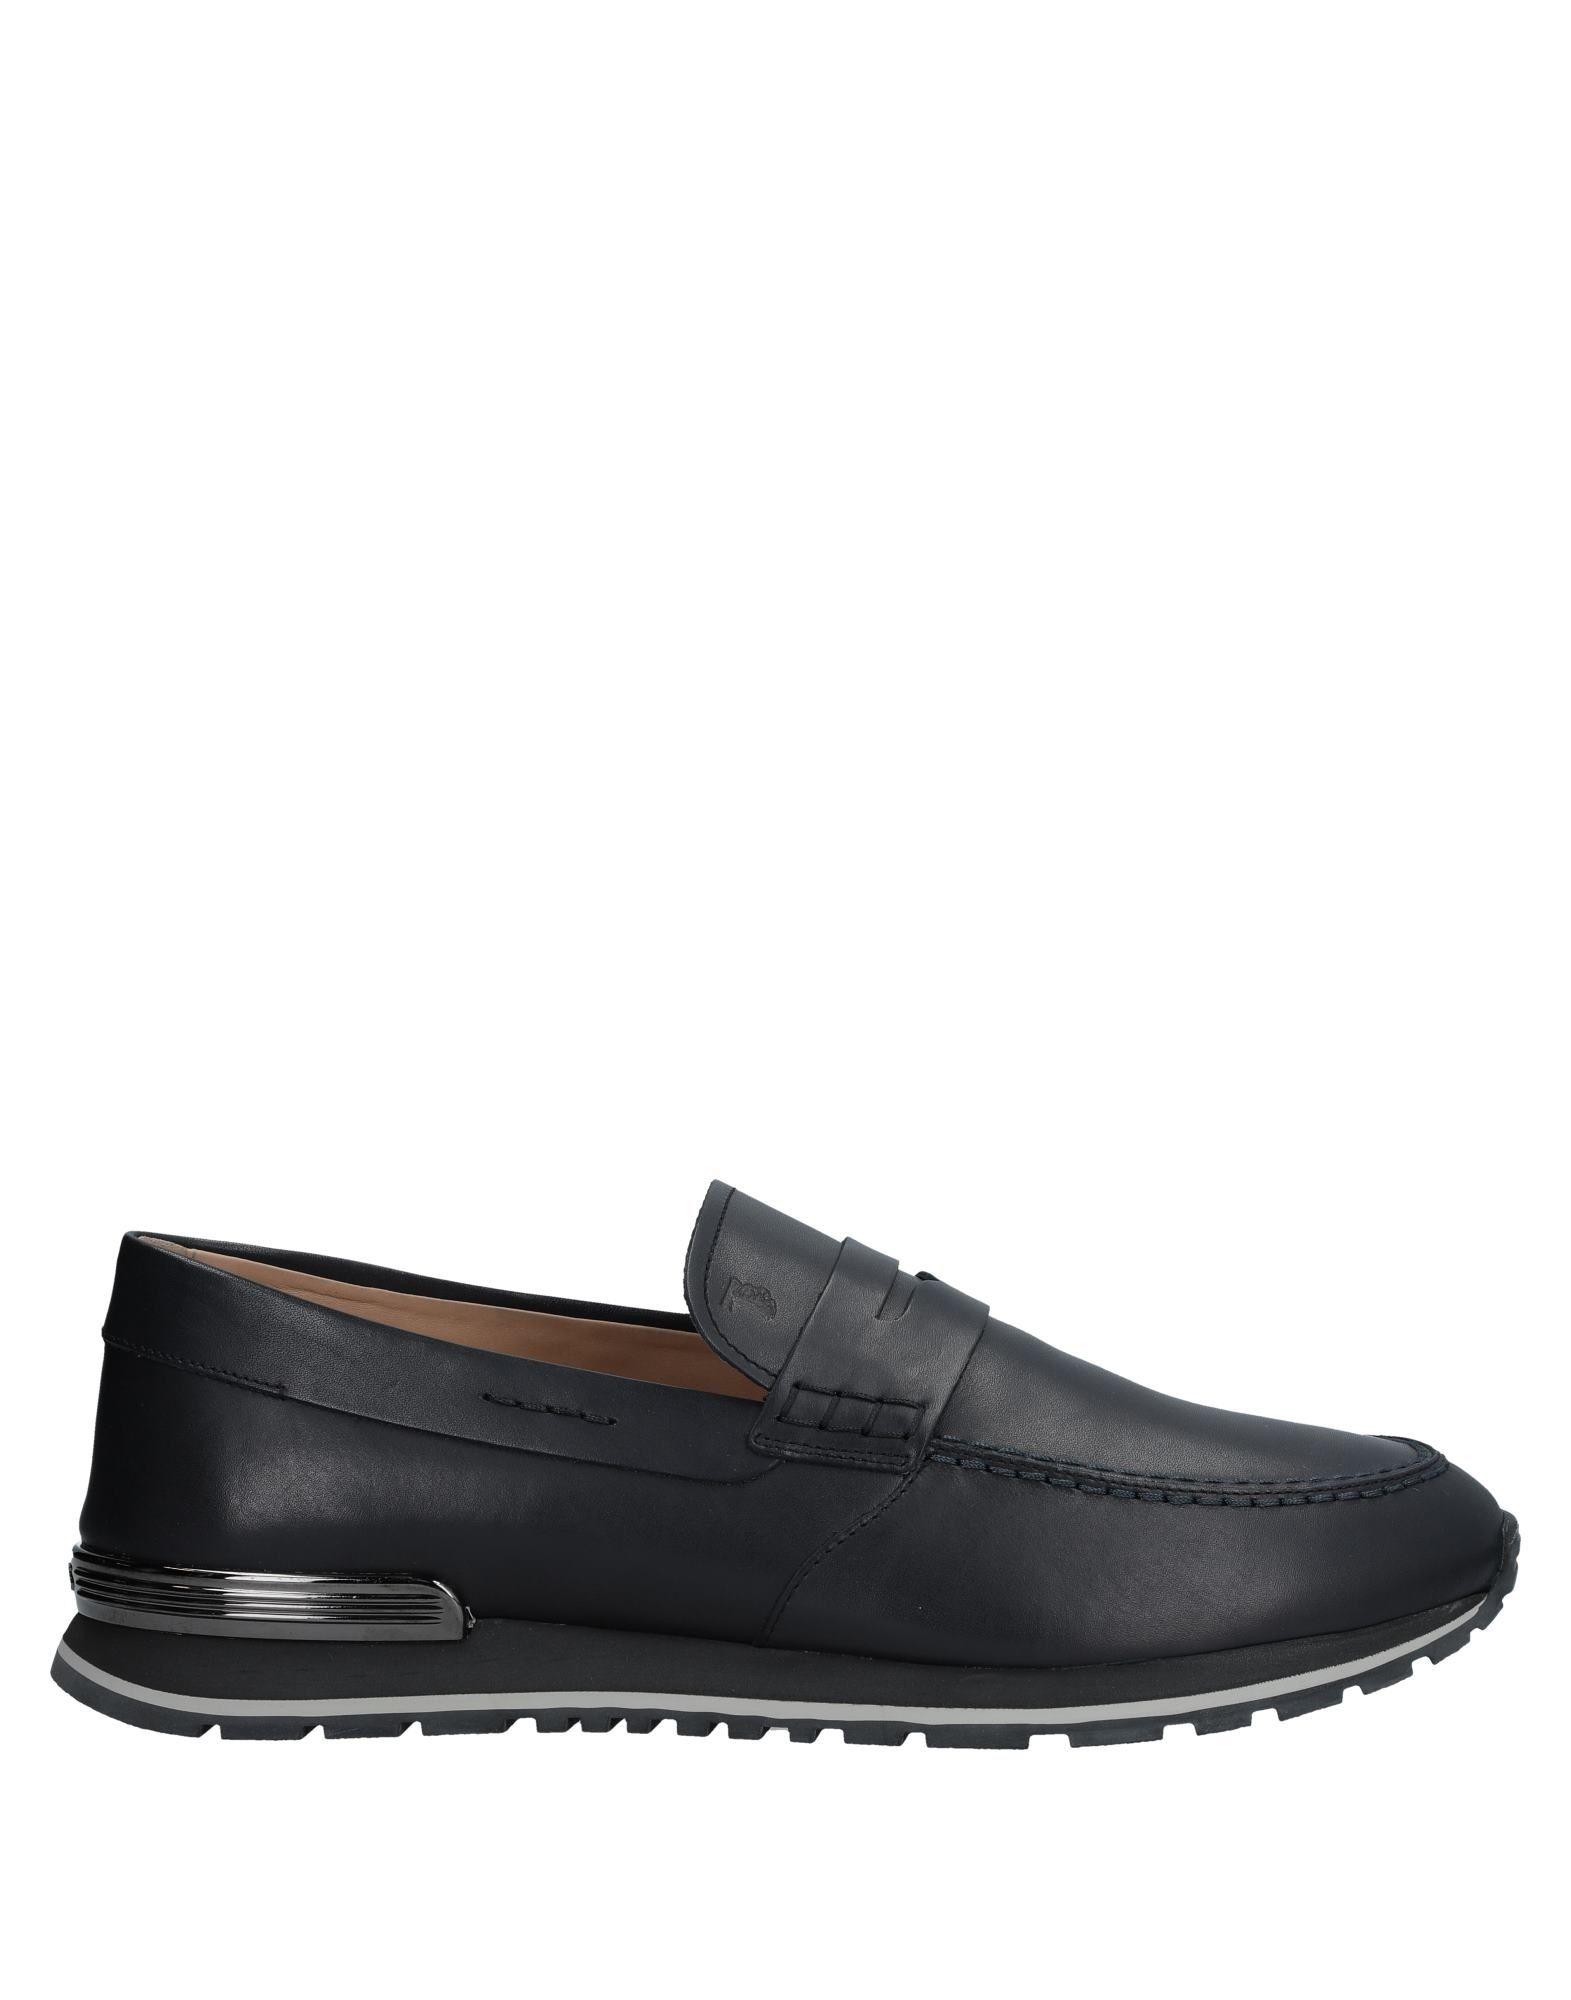 Tod's Mokassins Herren  11541334VV Gute Qualität beliebte Schuhe